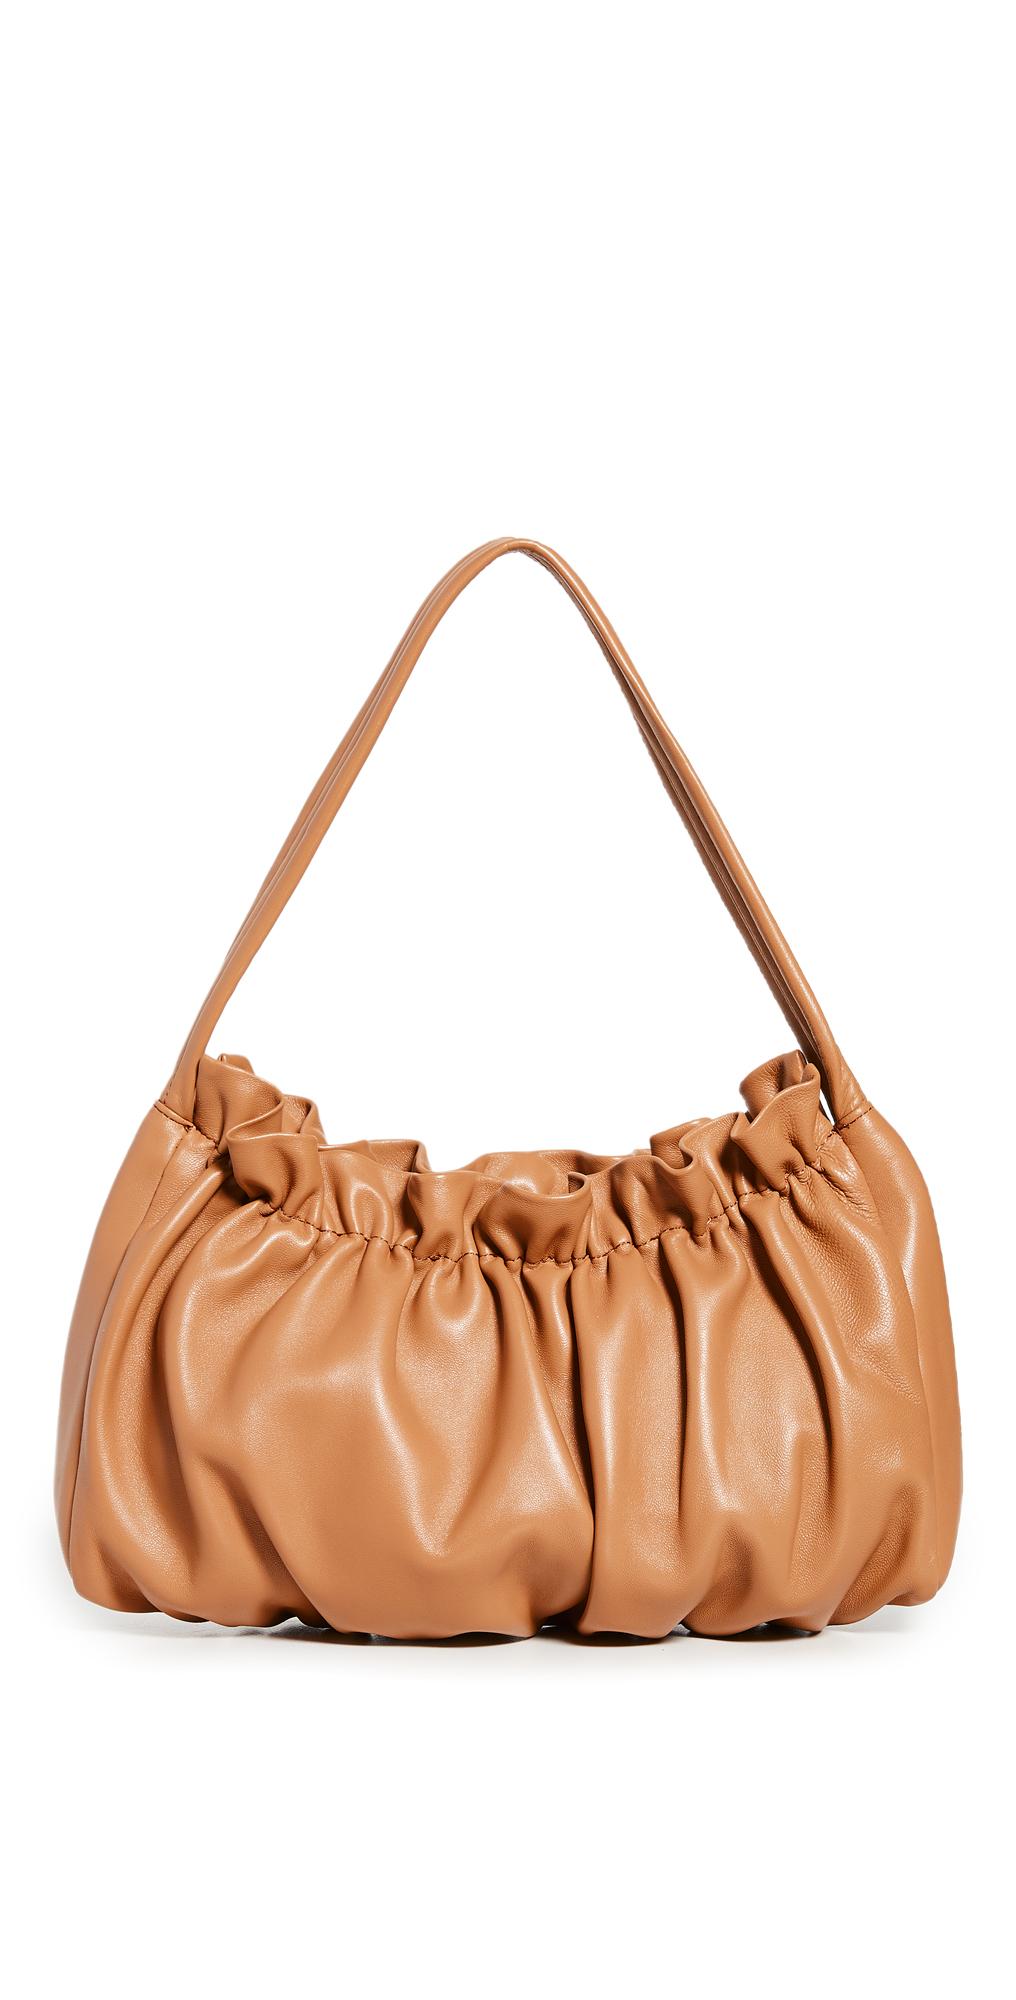 Loeffler Randall Alicia Gathered Baguette Bag